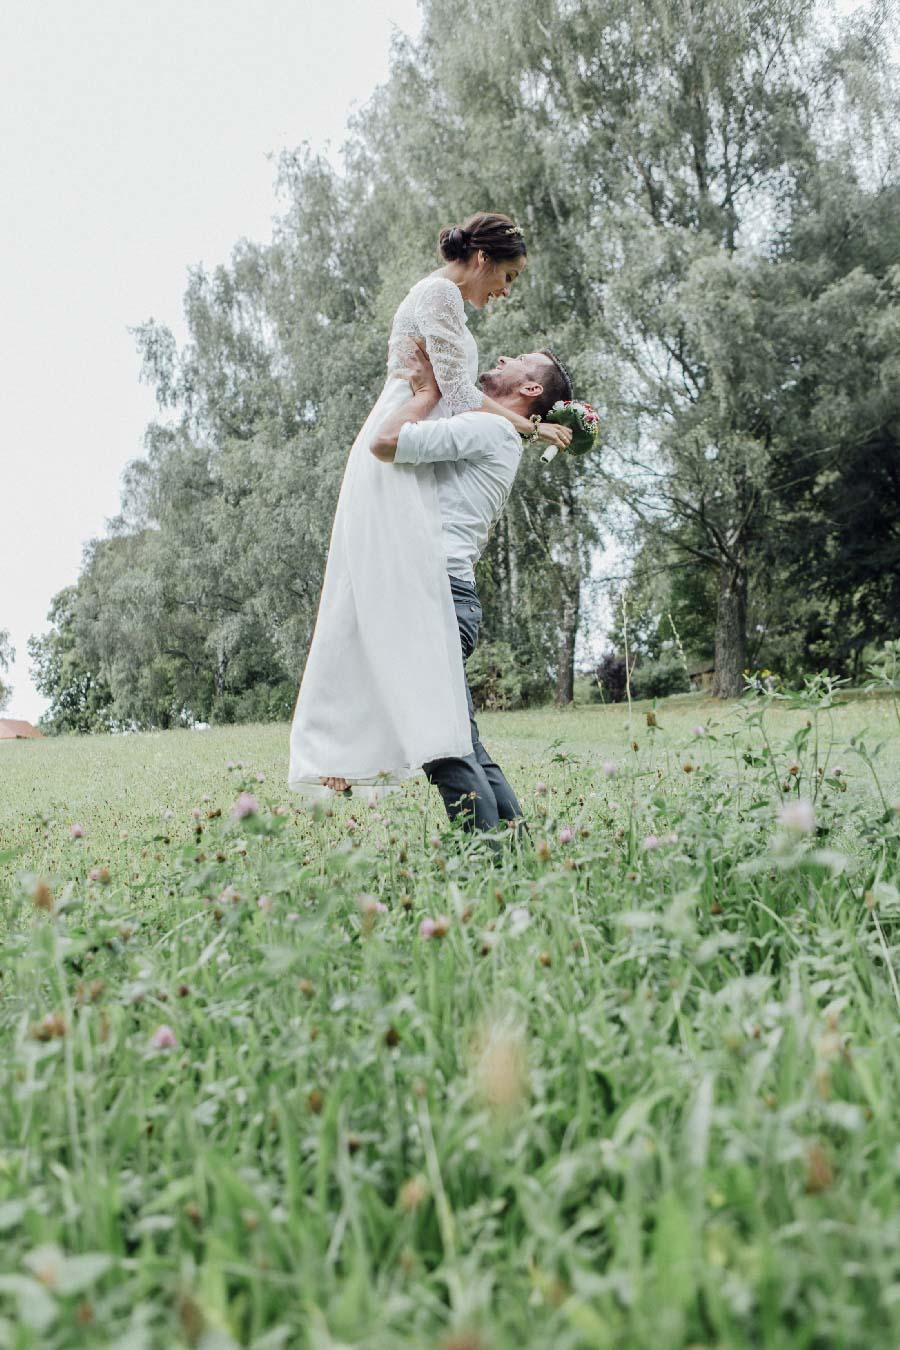 lockere-hochzeit-boho-stil-gut-dietersberg-loredana-la-rocca-50